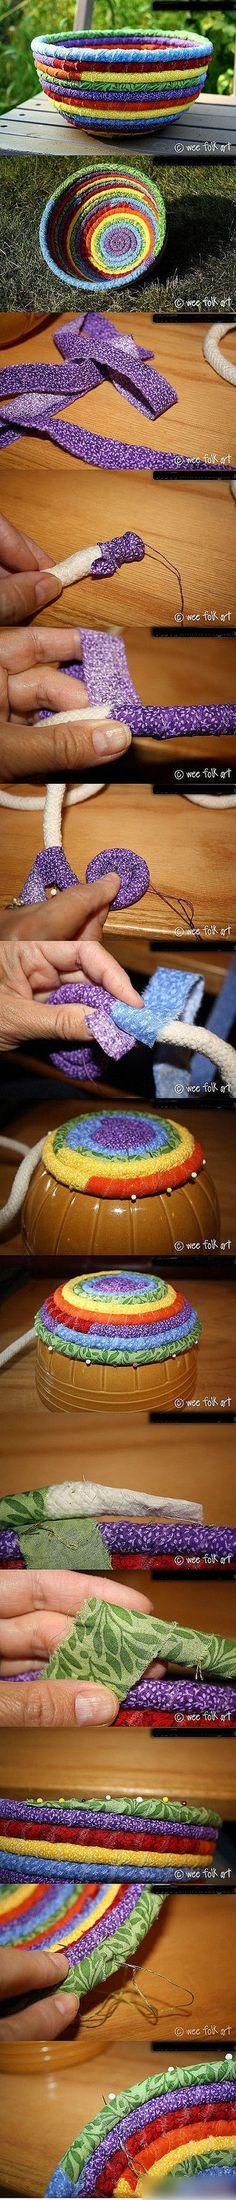 rag rugs, fabric bowls, rope, diy crafts, basket, metal furniture, scrap fabric, fabric scraps, textile art